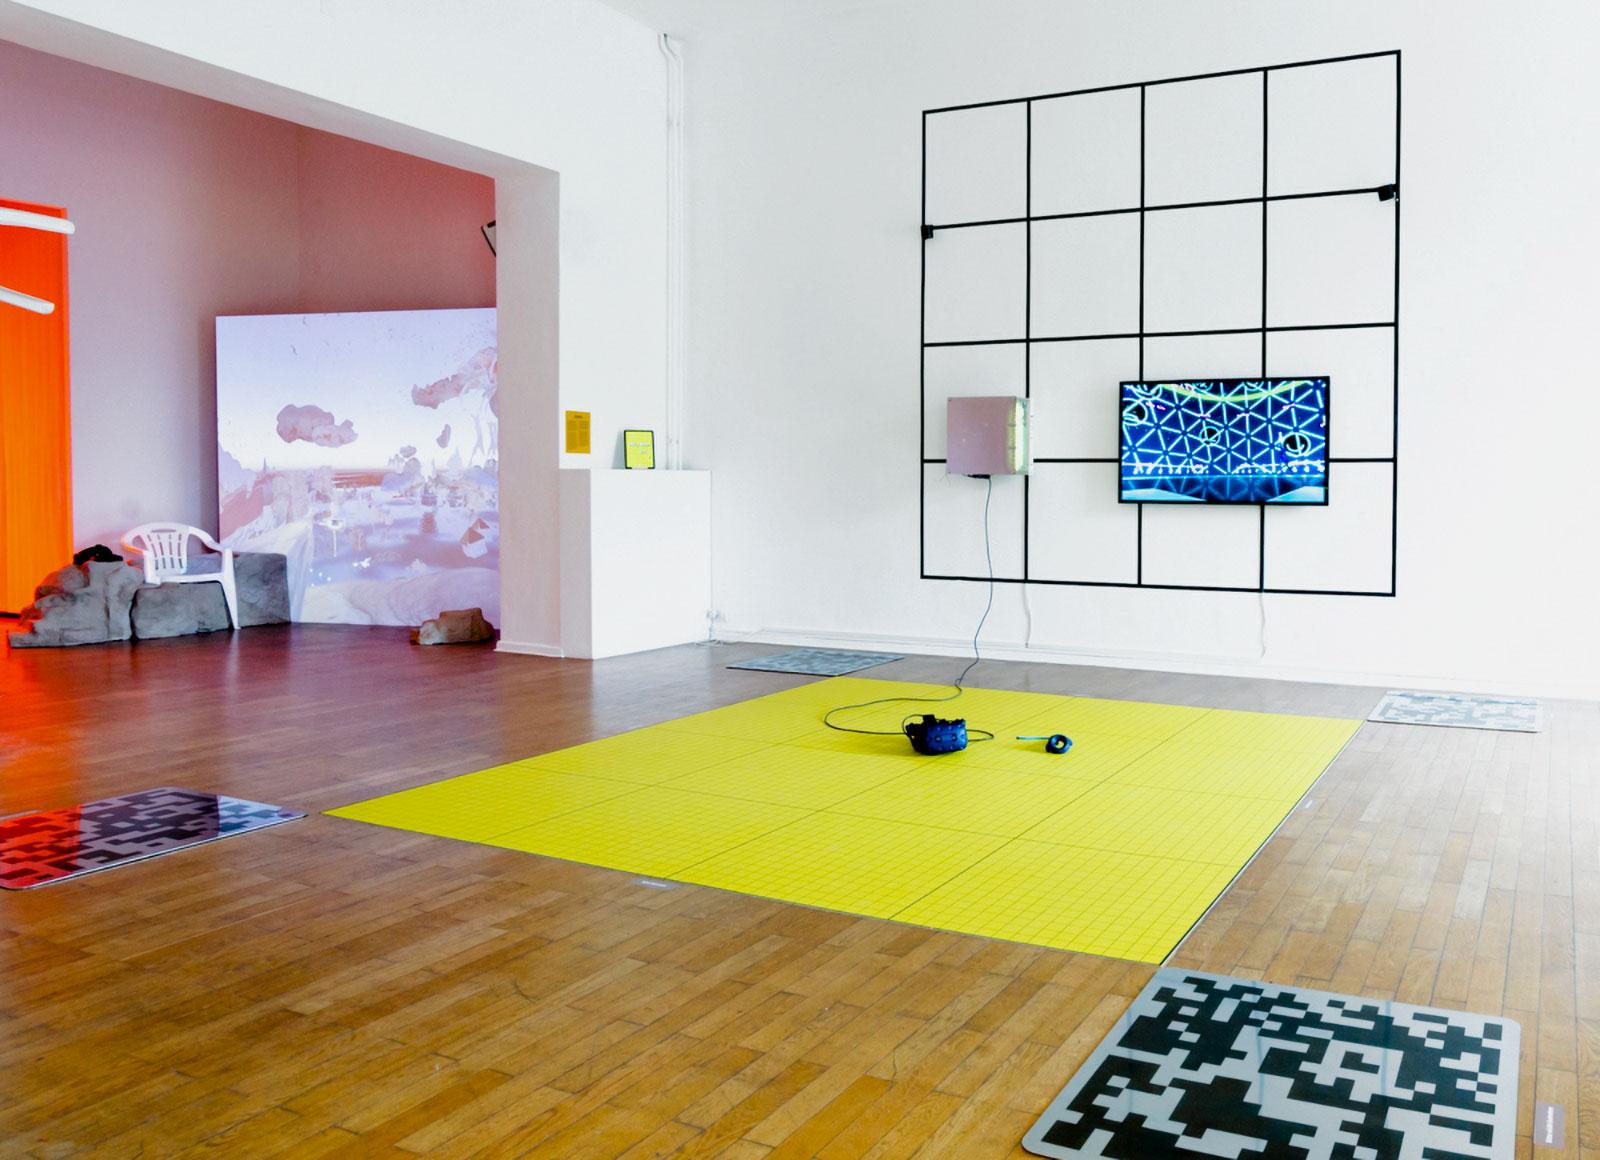 Poly Mesh, Installationview, 2021